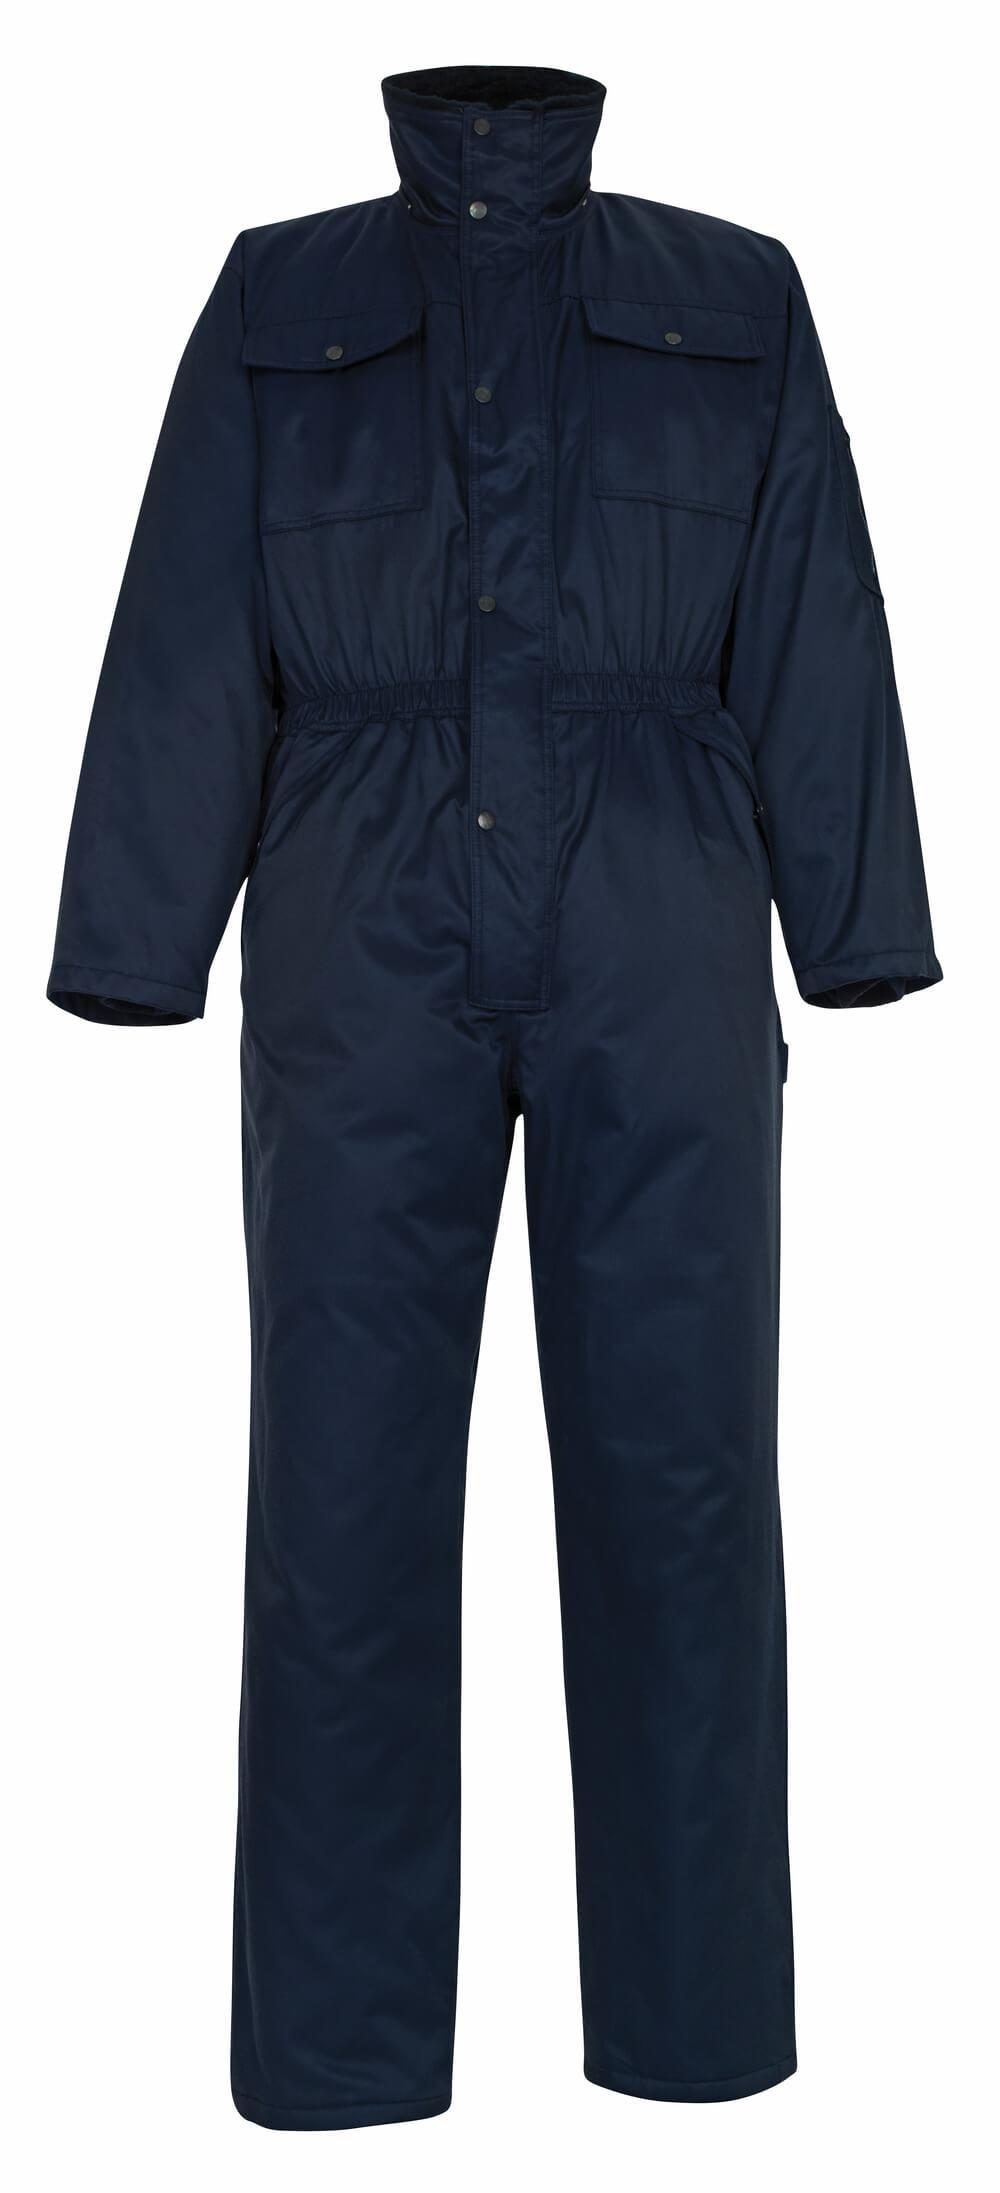 00517-620-01 Mono de invierno - azul marino